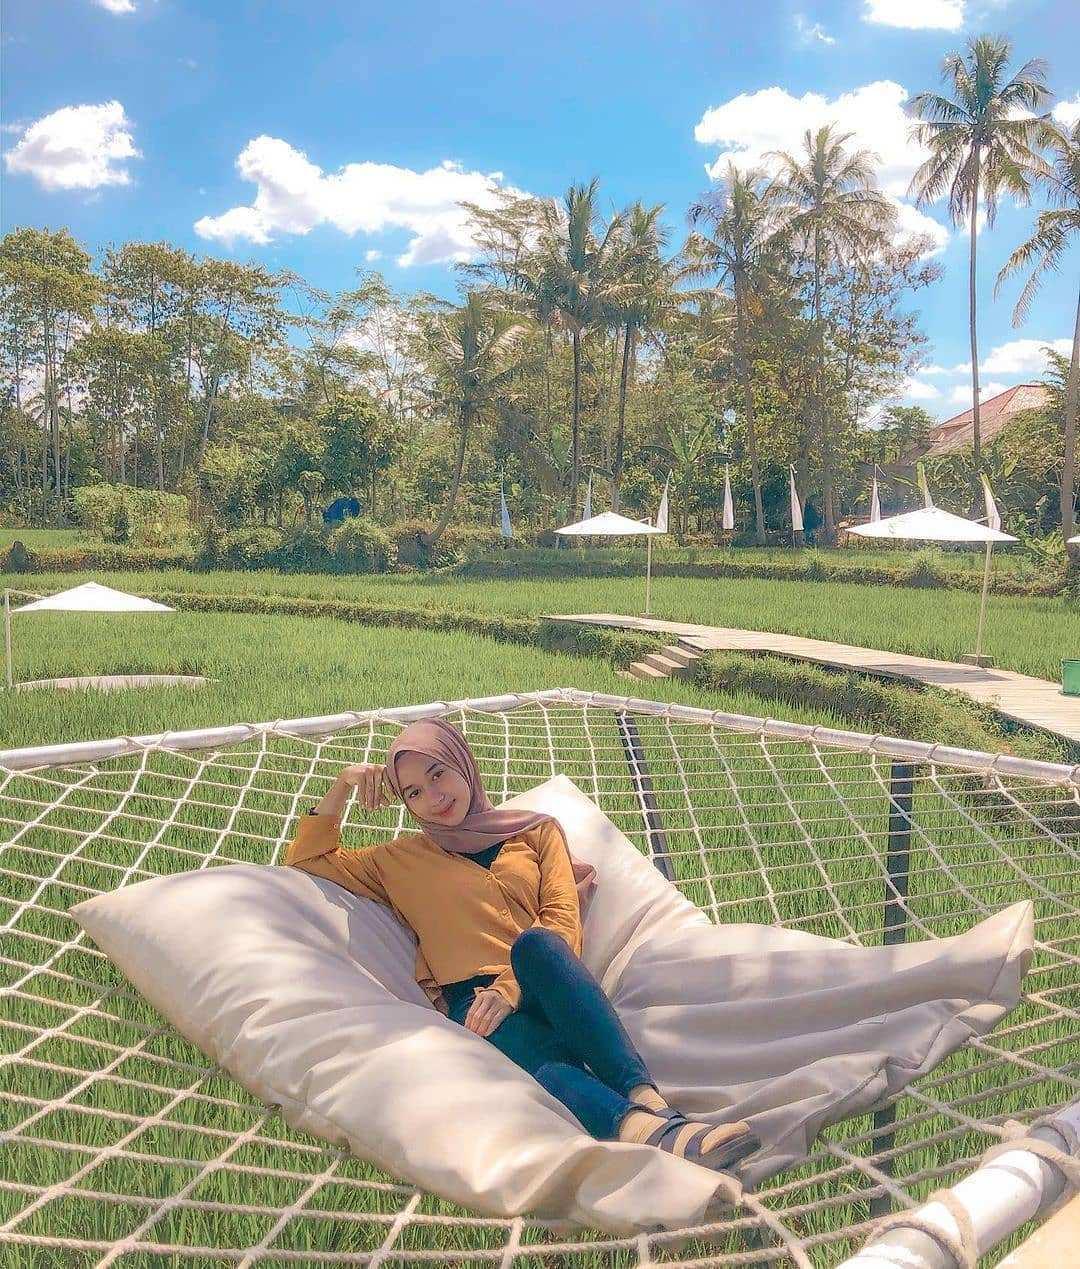 Tempat Tidur Melayang di Svargabumi Borobudur, Image From @lisasft